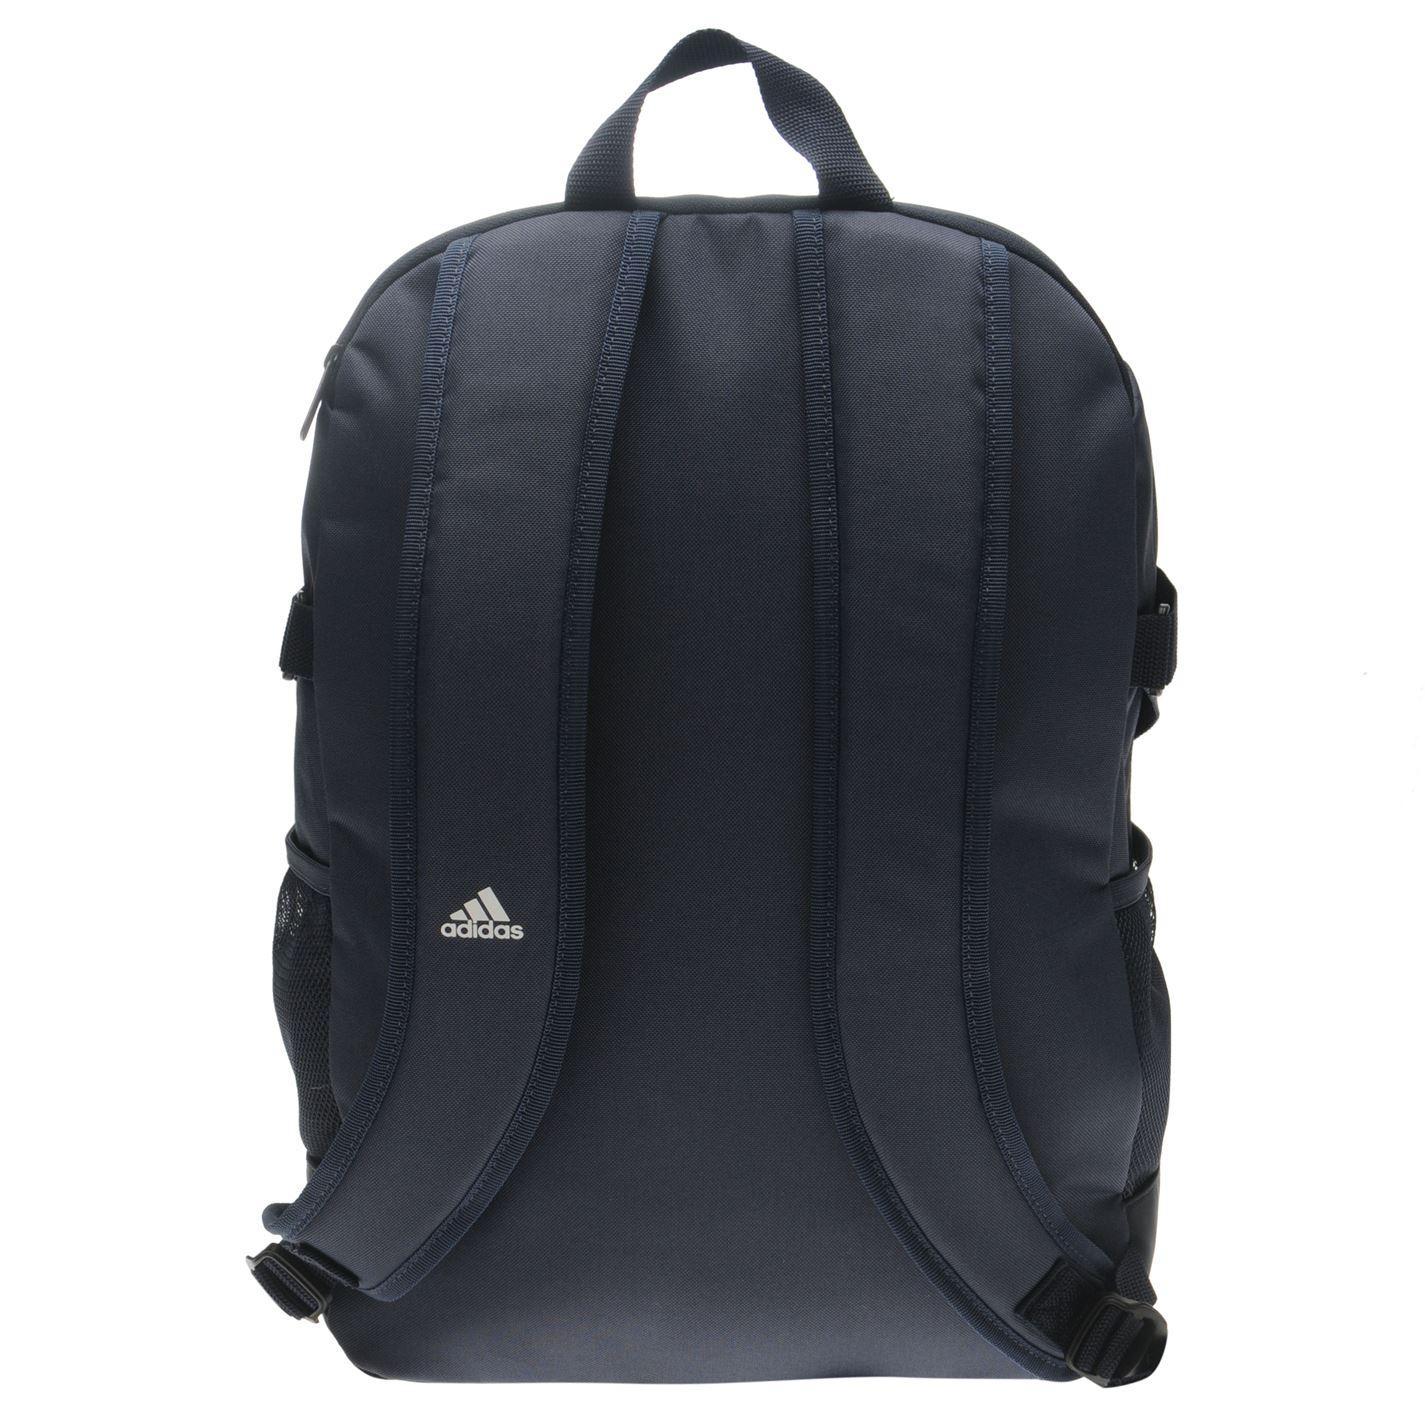 4d94d04dbf22 adidas Unisex Power 4 Backpack Back Pack Zip ClimaCool Mesh | eBay